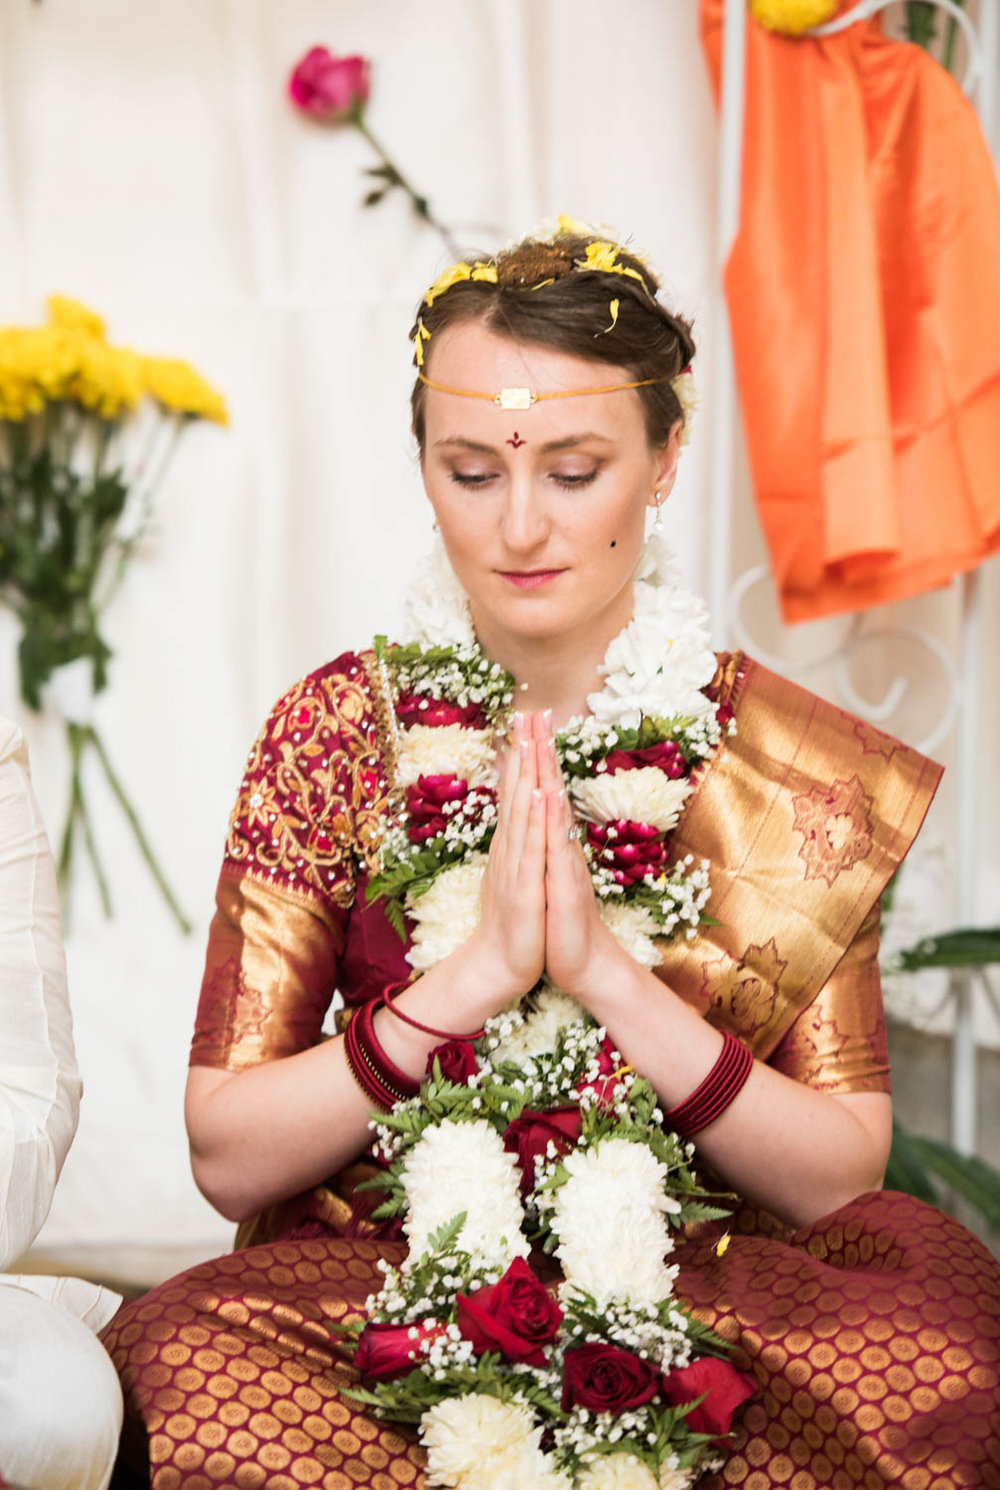 ecaterina-chandu-indian-wedding18.jpg